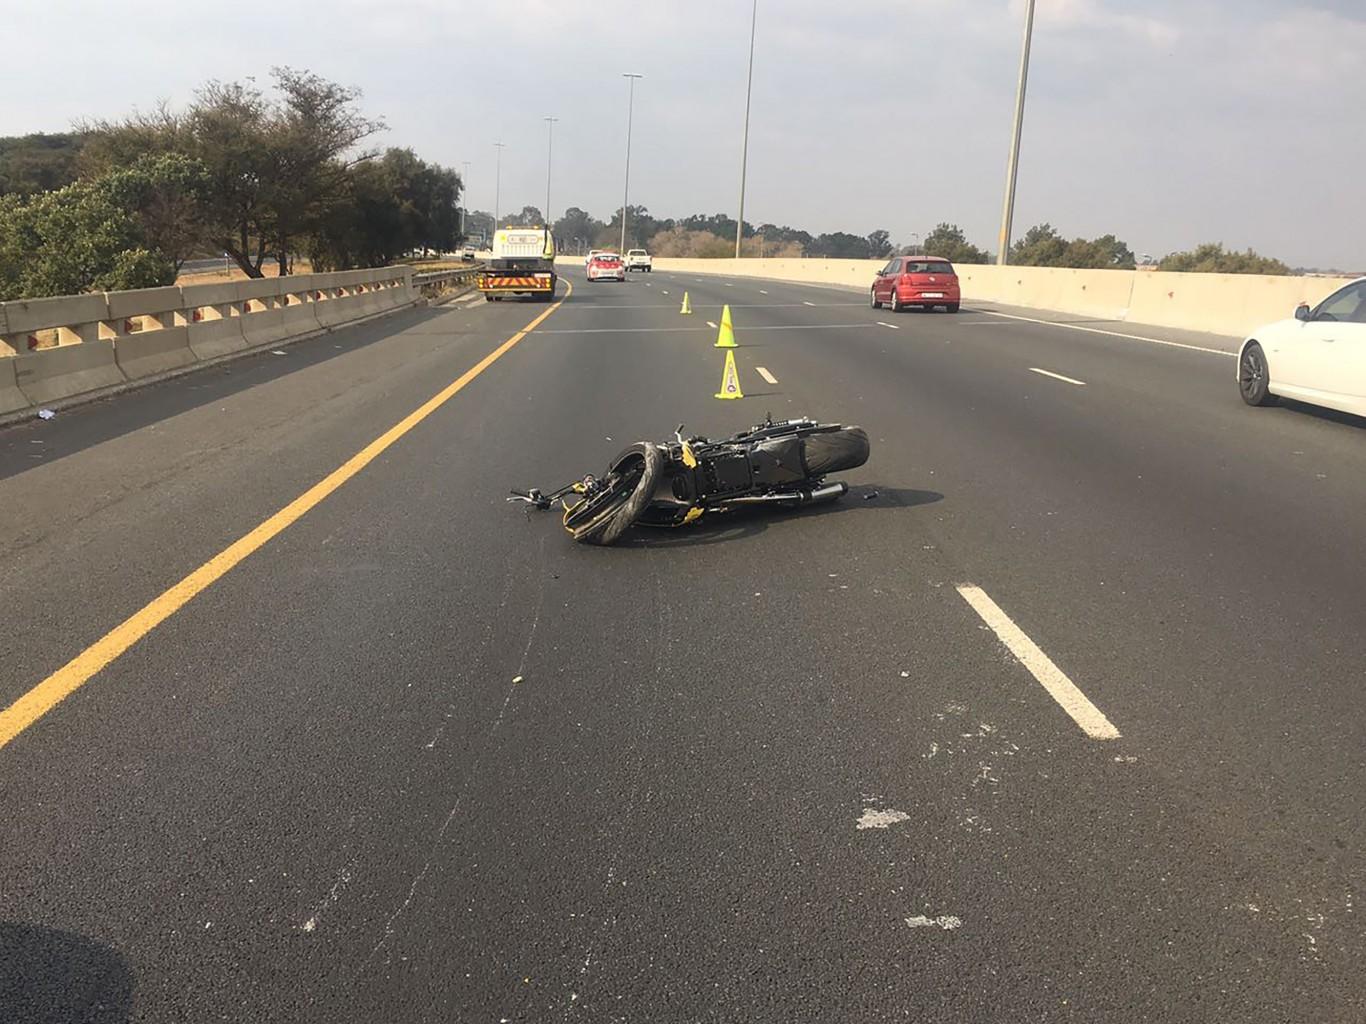 Motorbike rider involved in fatal crash on N12, Benoni